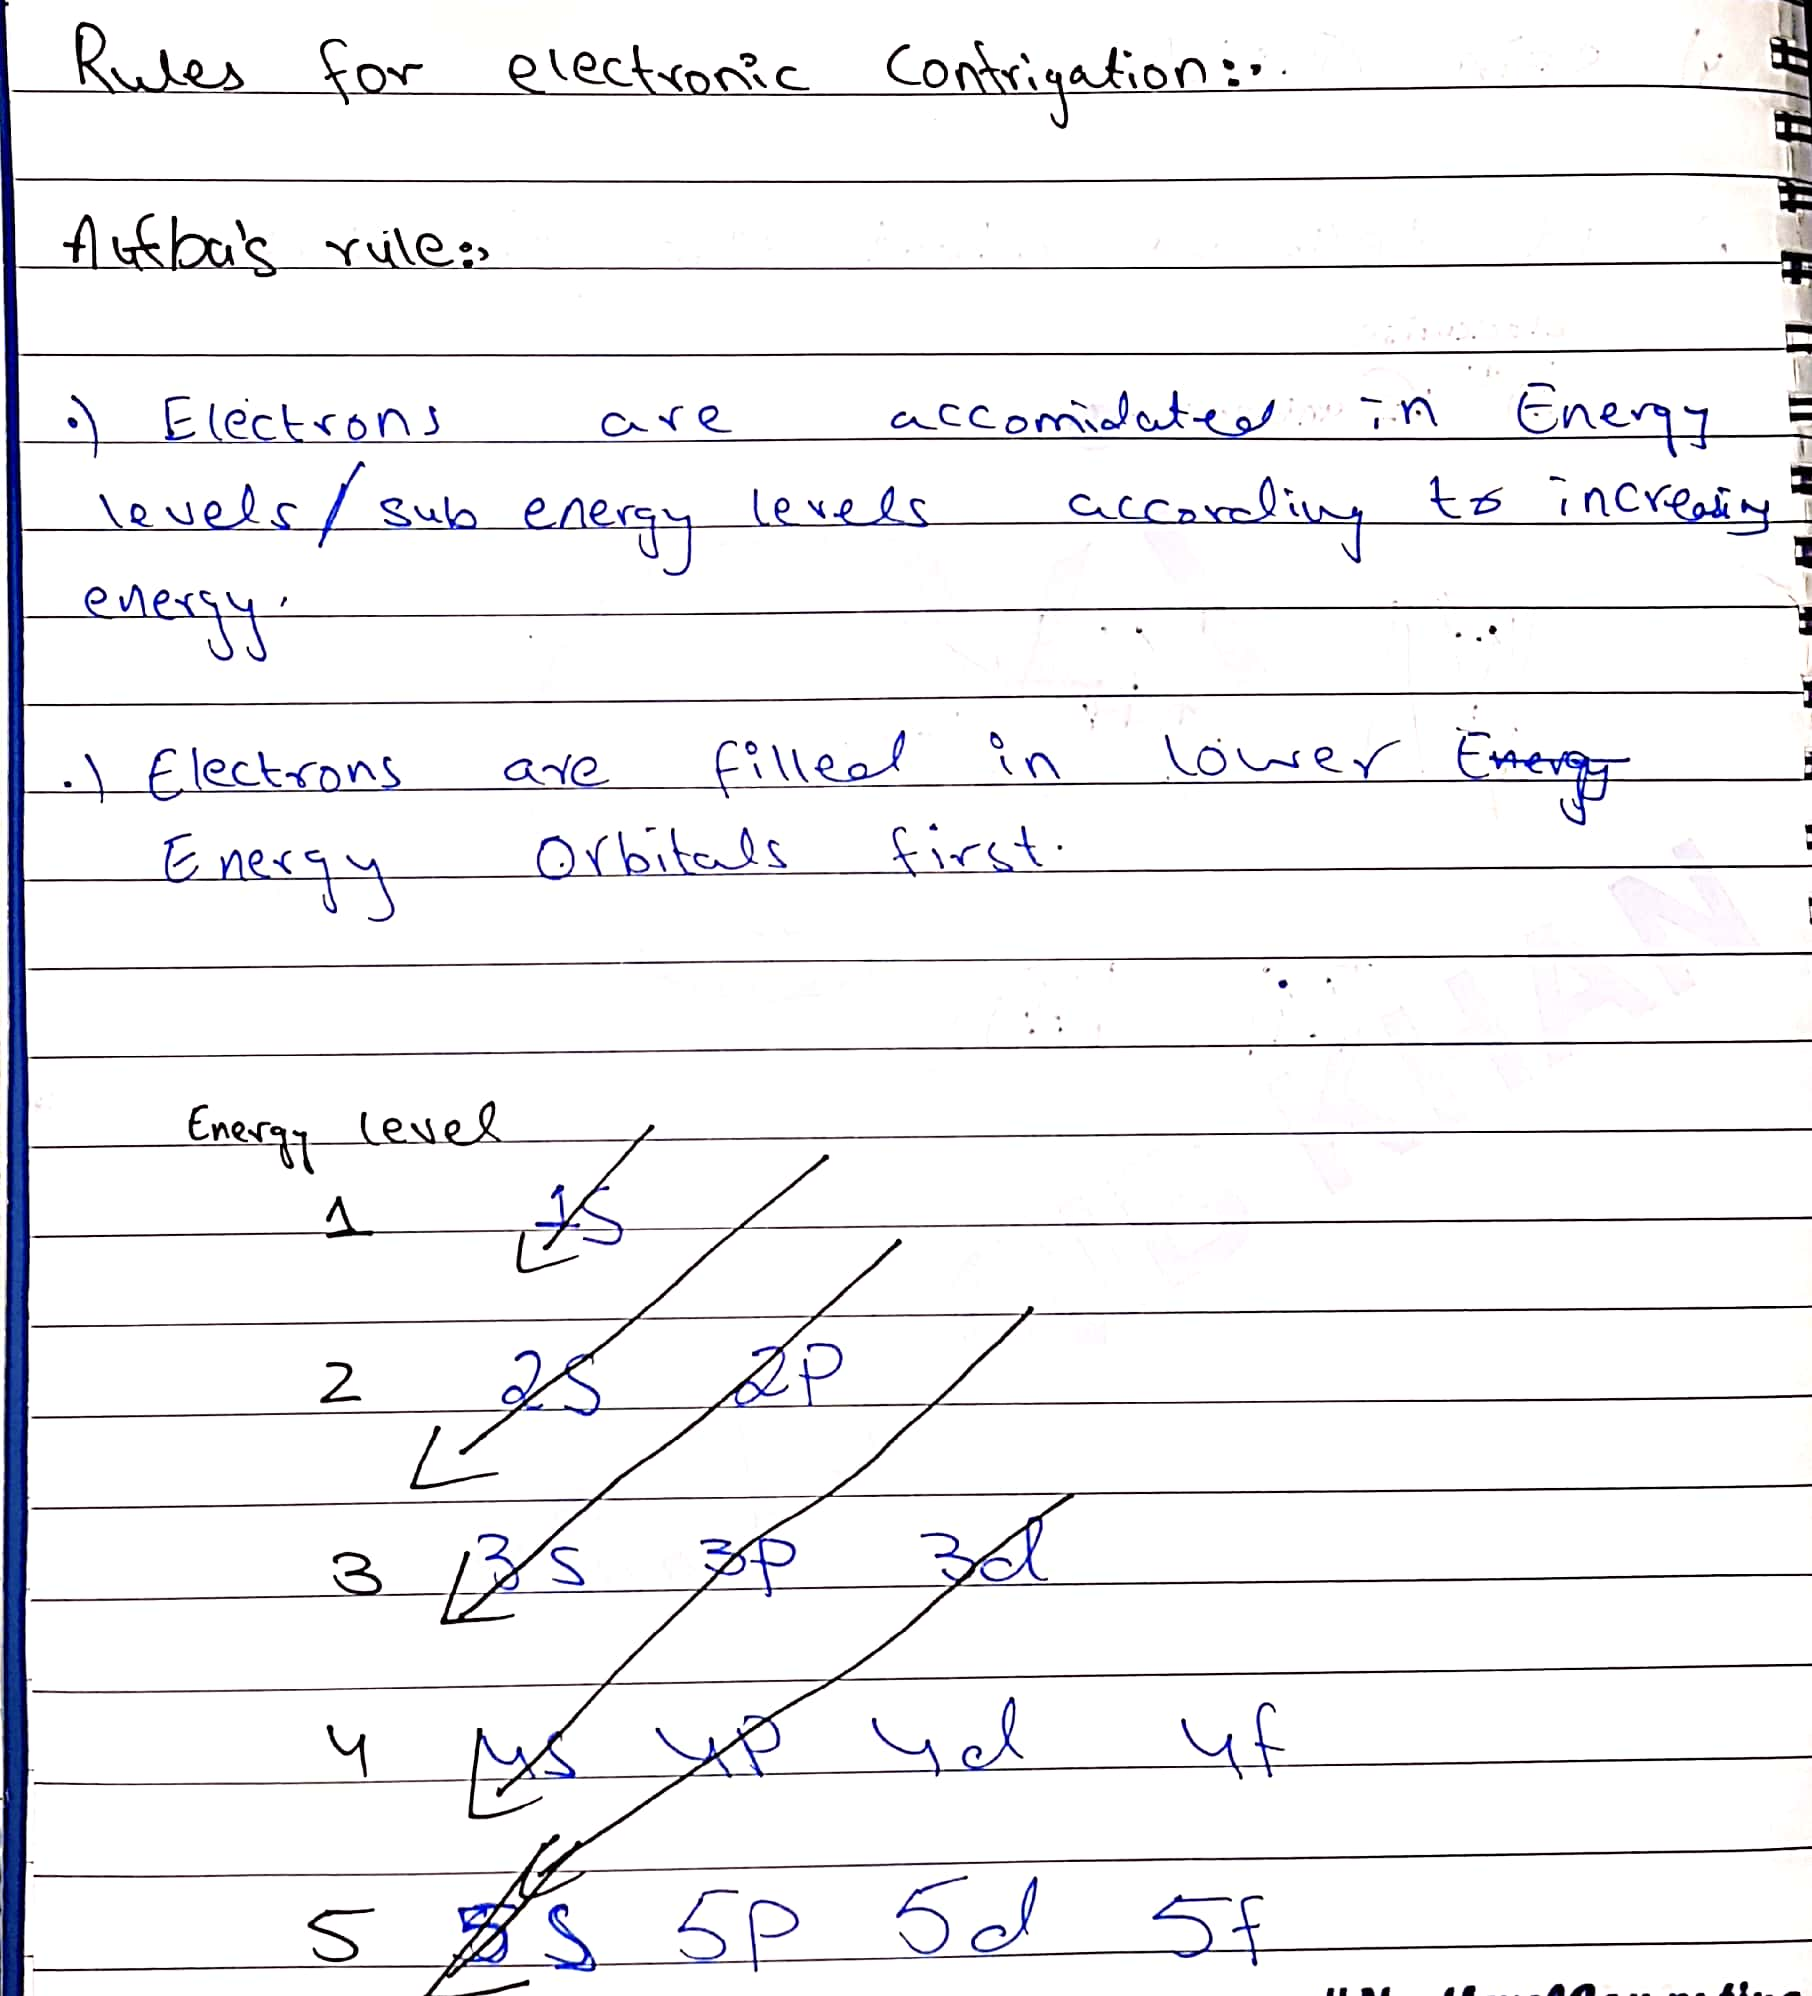 As chem by Sir Rizwn_6